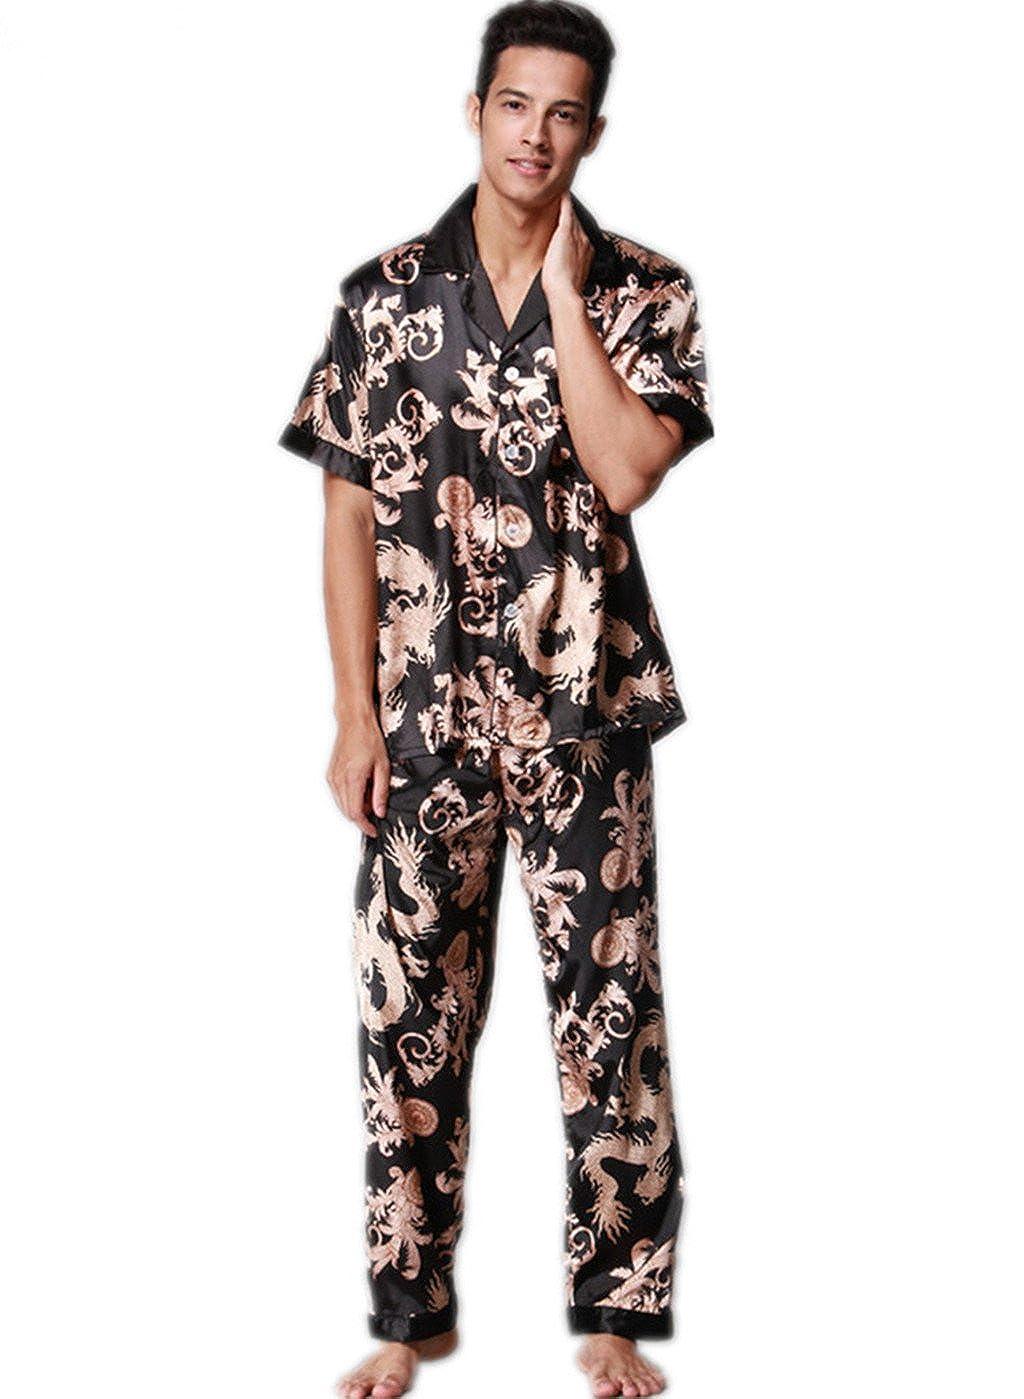 VERNASSA Mens Short Sleeves Sleepwear Silk Satin Pajama Set Pajama Shirt and Pant Satin Loungewear VE0282